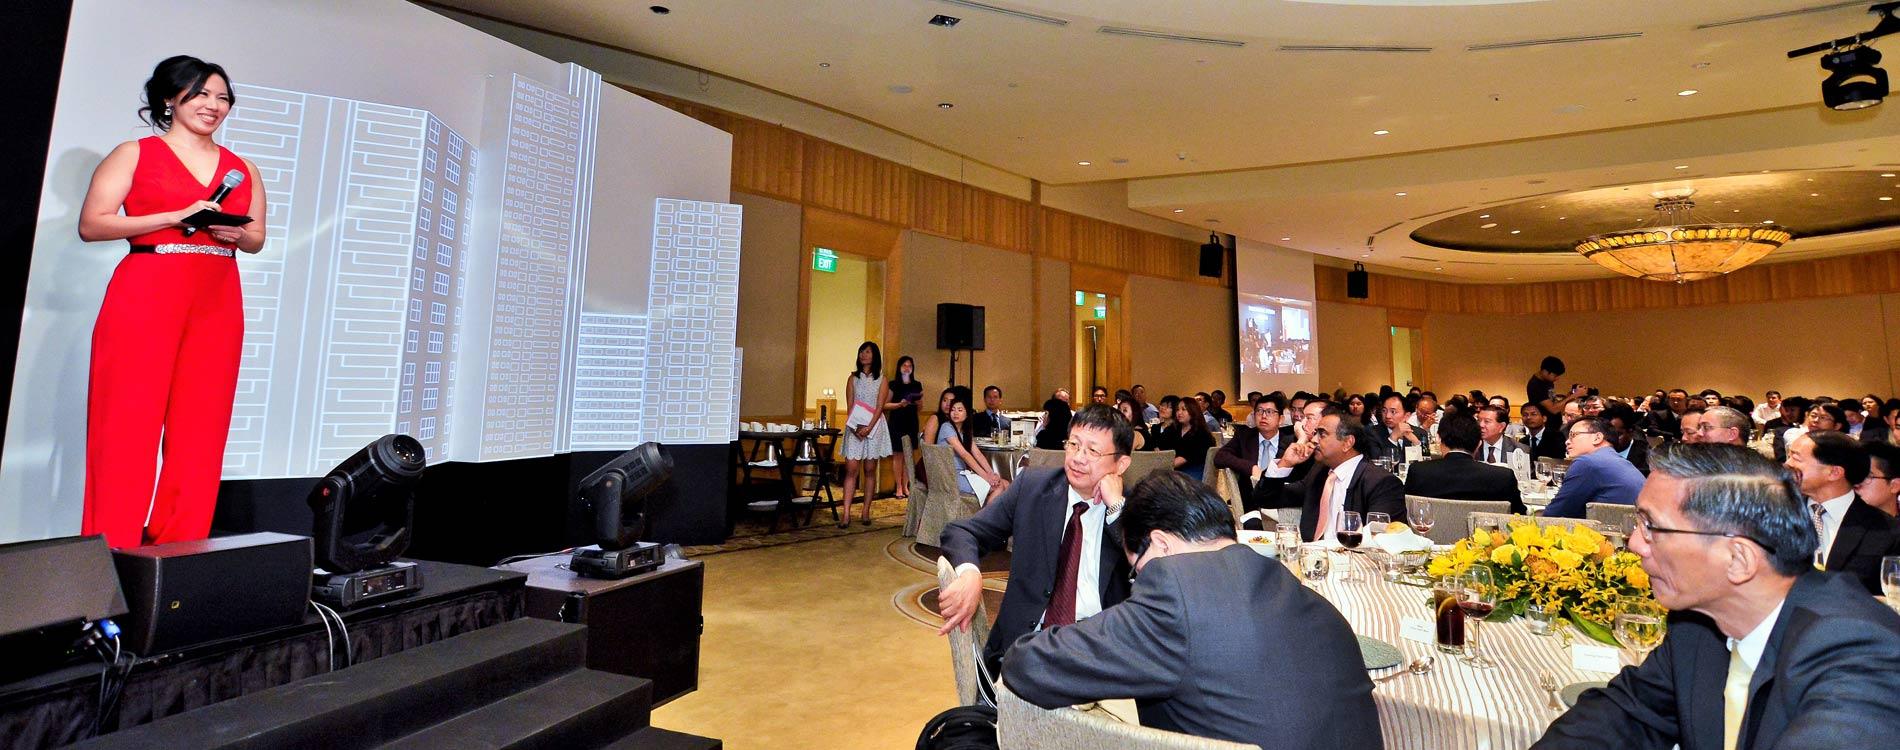 Singapore Events Management Company and Gala Awards Singapore